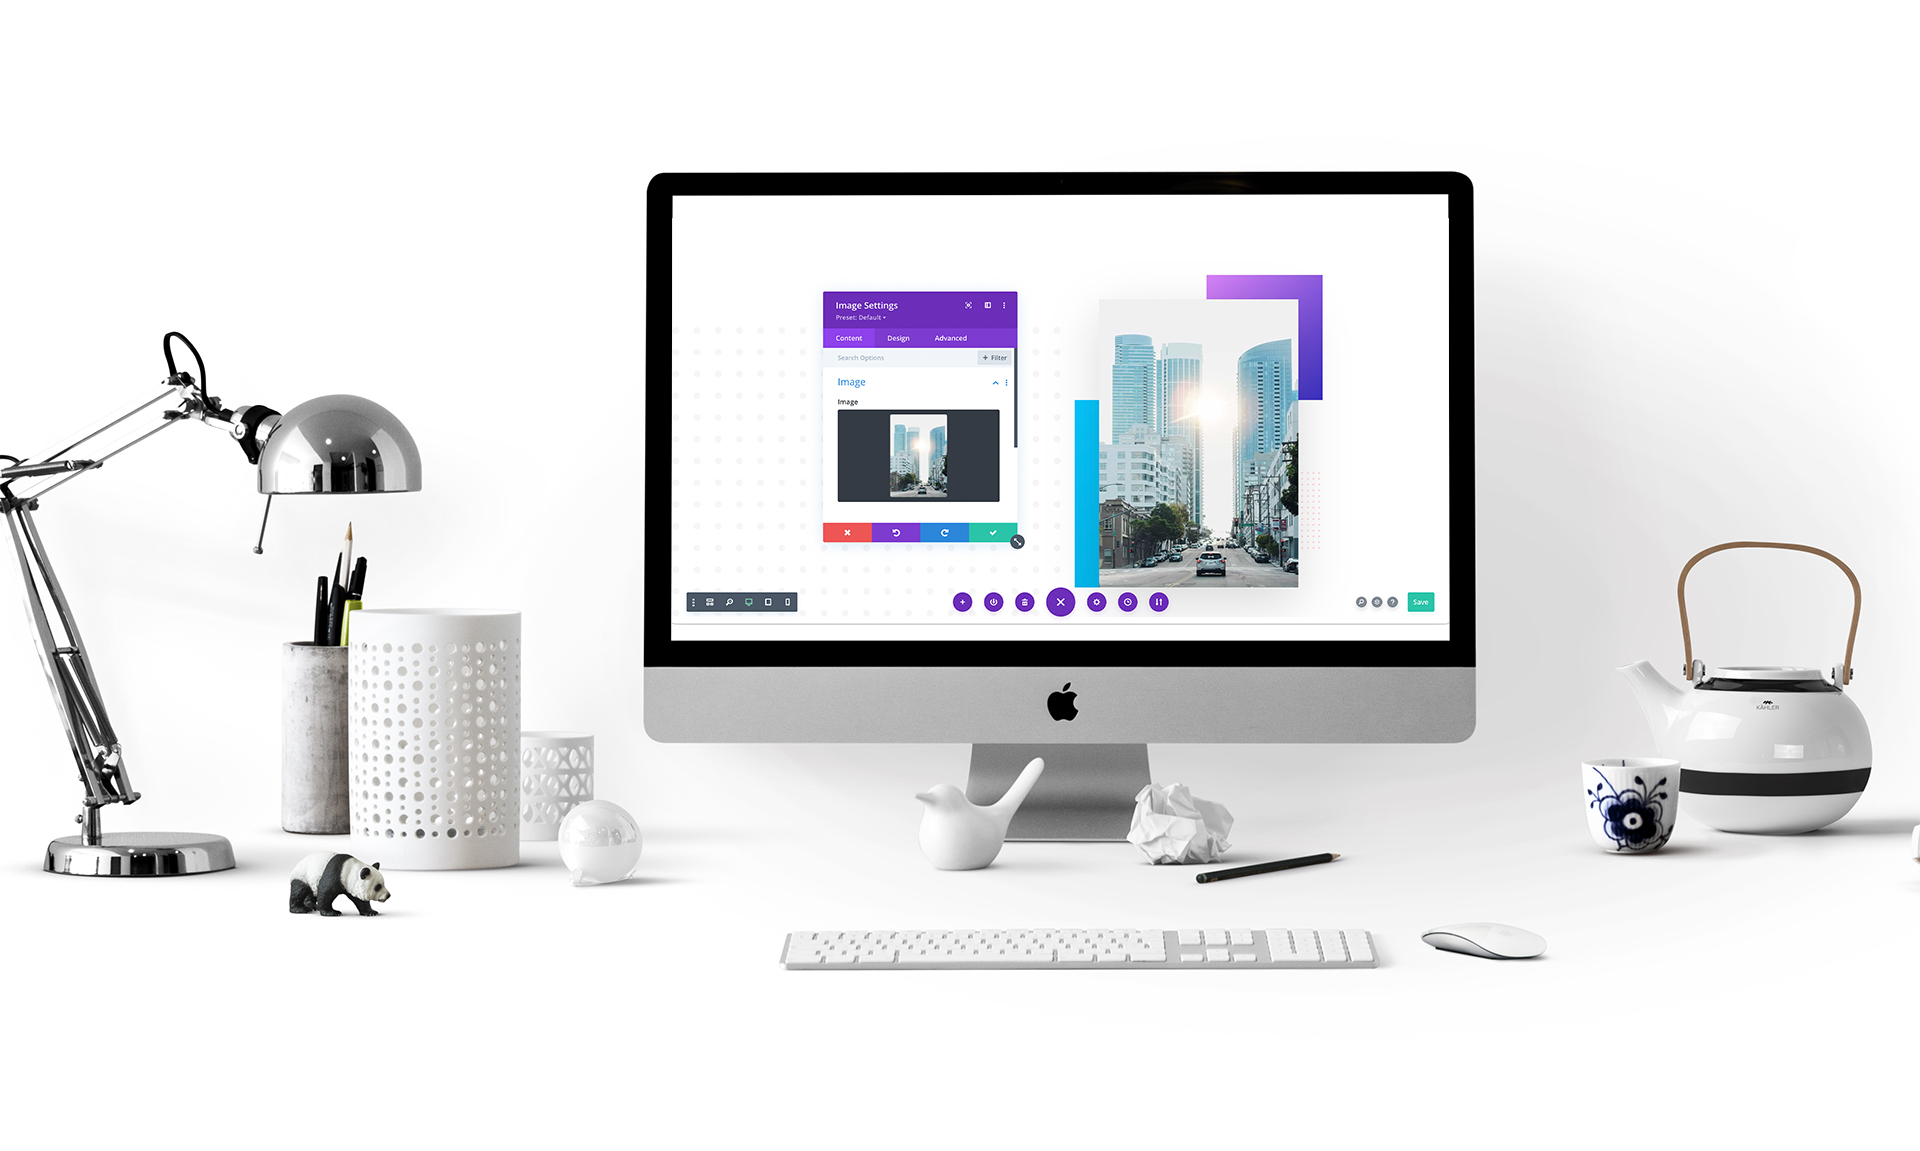 Divi Theme Builder Tutorial - The Basics